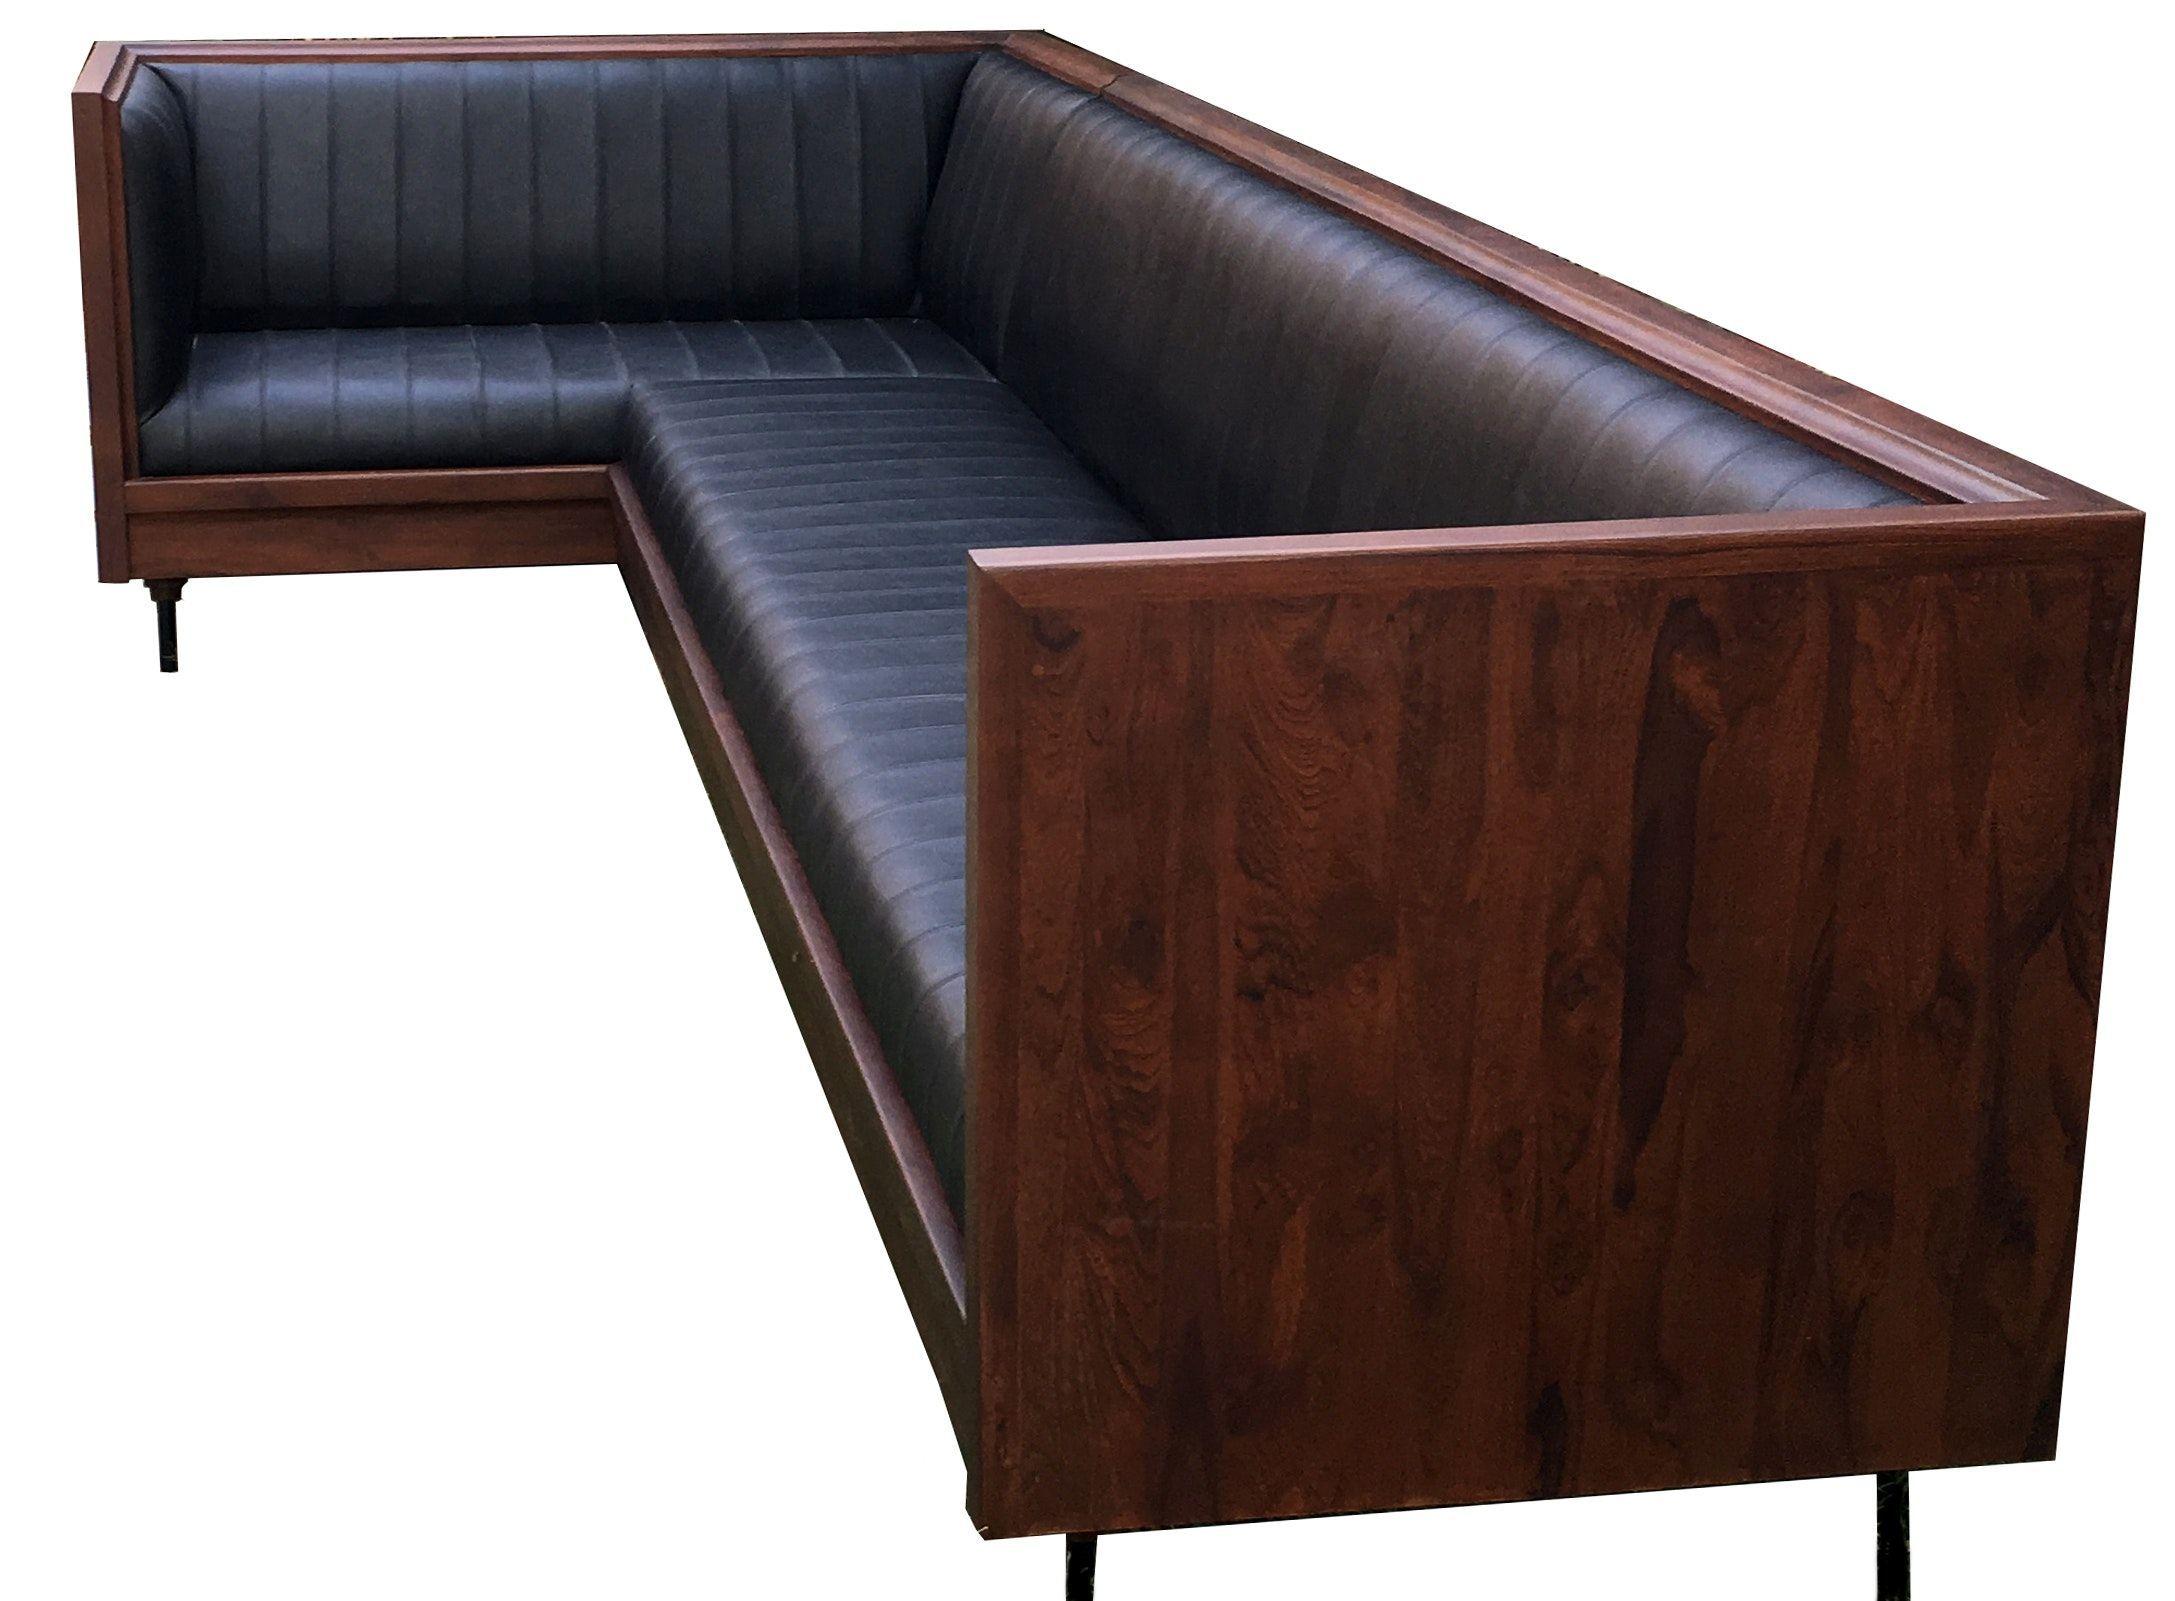 Living Room Couch L Shape Orah A Lshaped Sofa L Shaped Sofa L